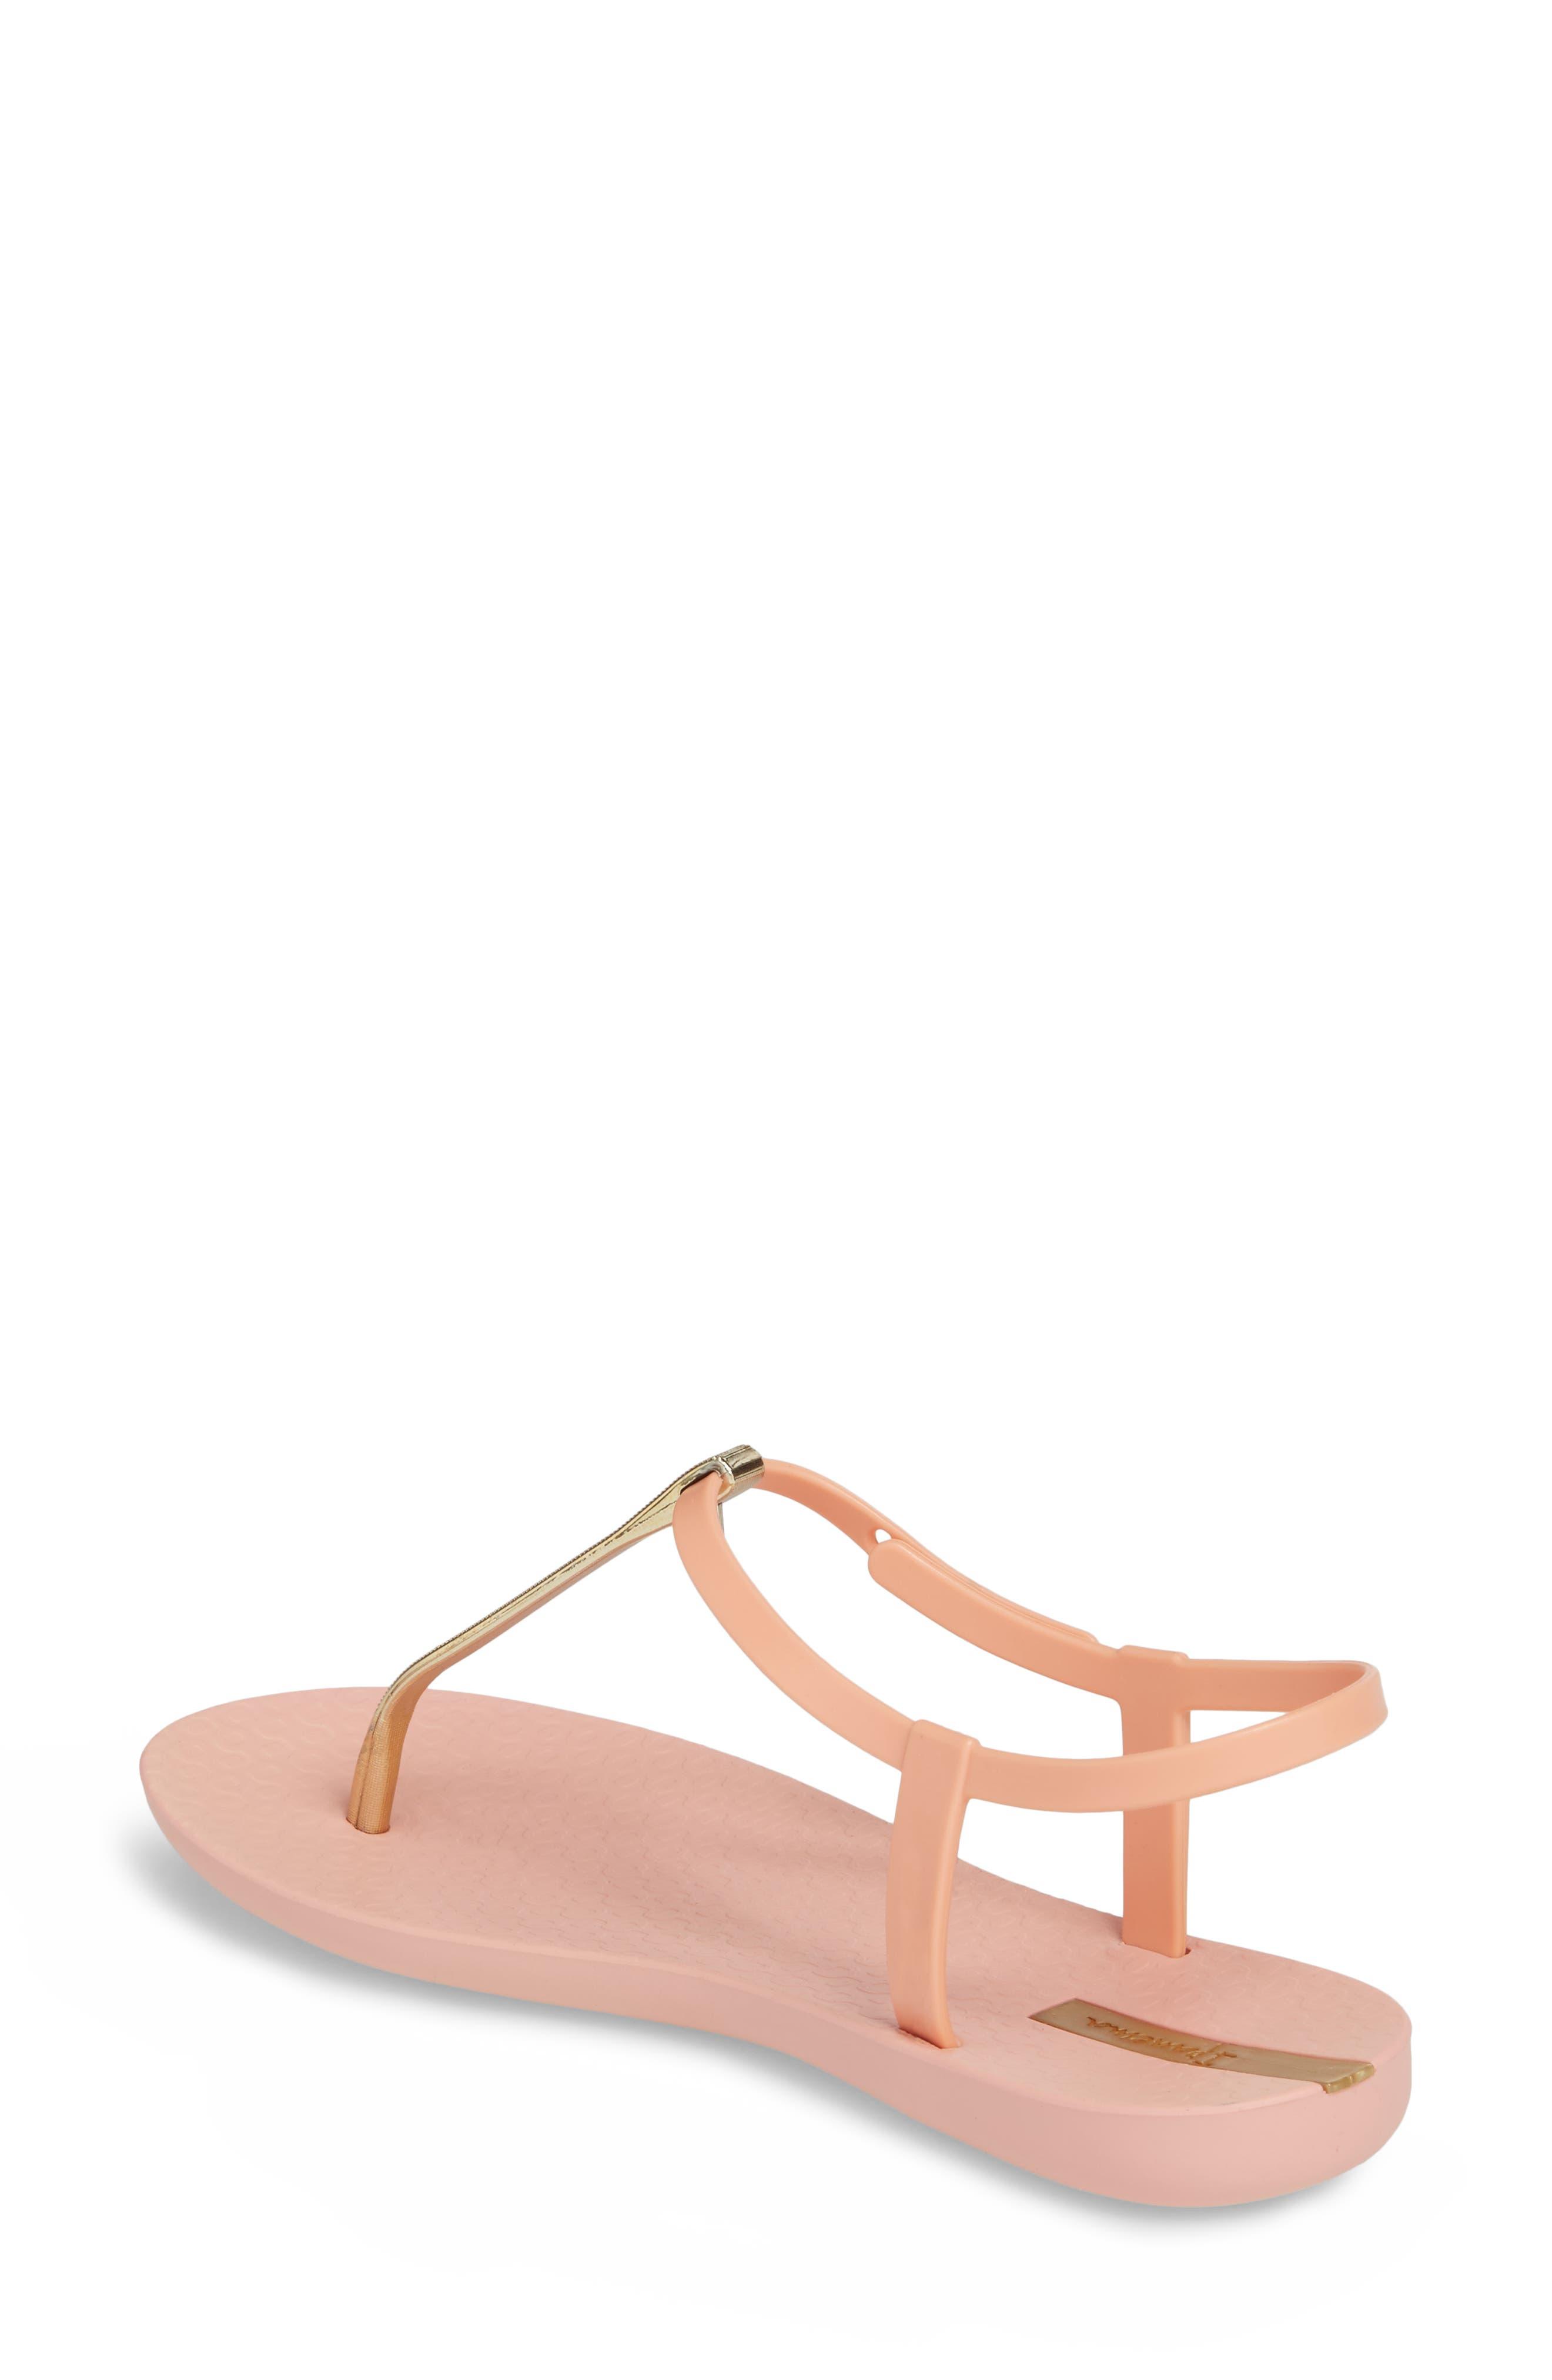 Bandeau Sandal,                             Alternate thumbnail 2, color,                             Pink/ Gold